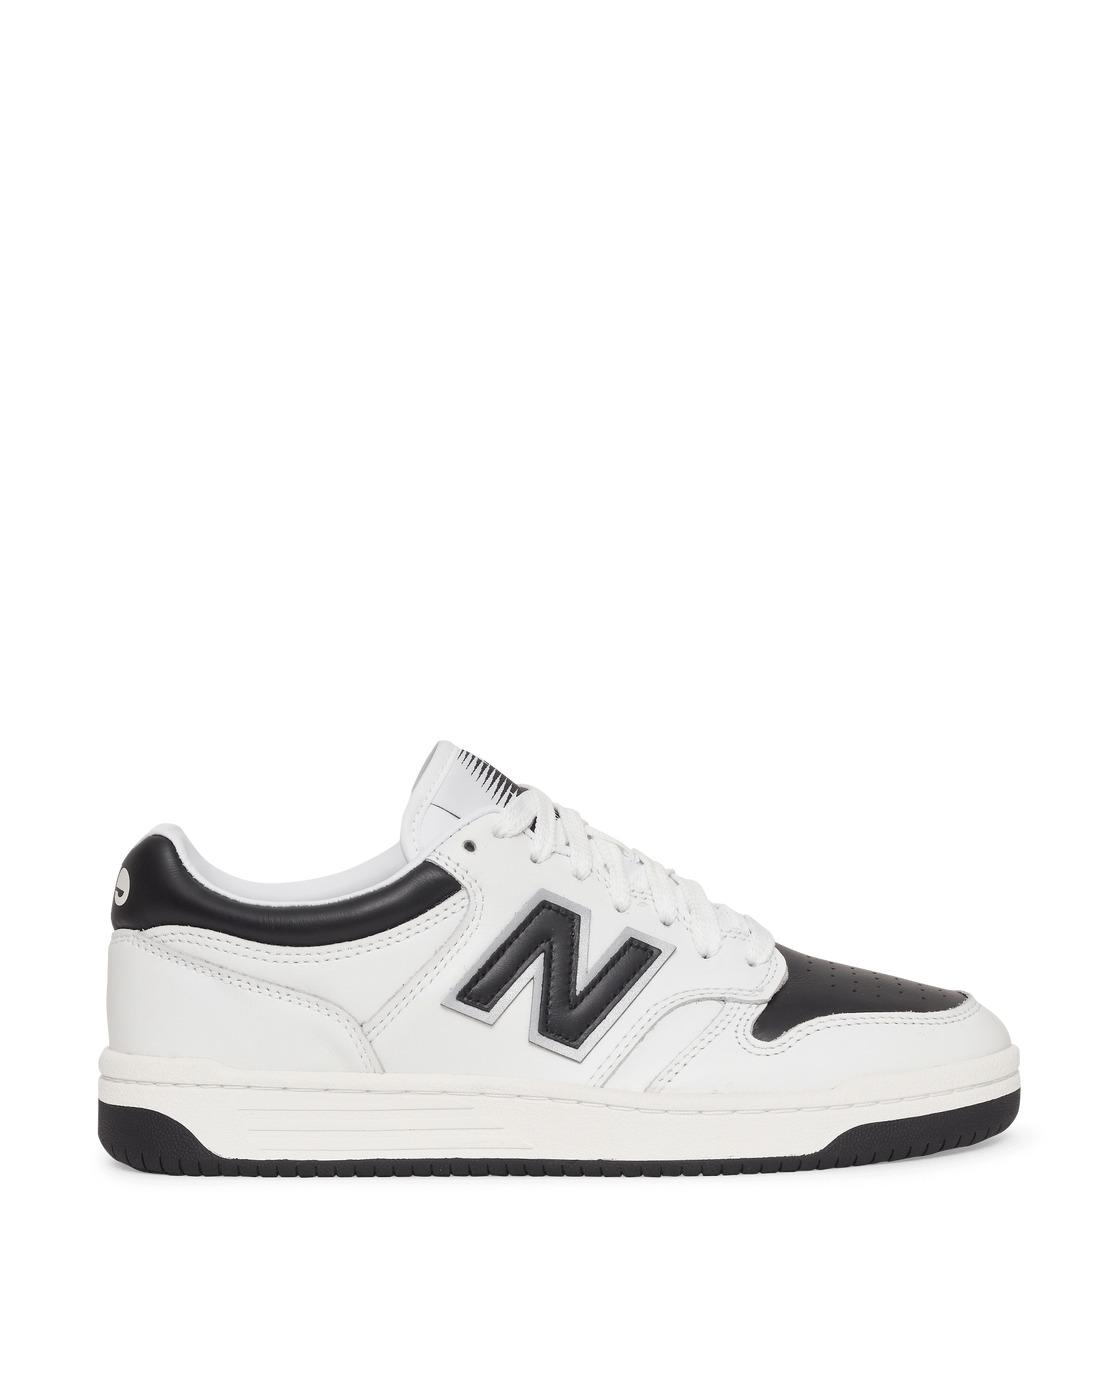 Photo: Junya Watanabe Man New Balance Bb480lma Sneakers White/Black